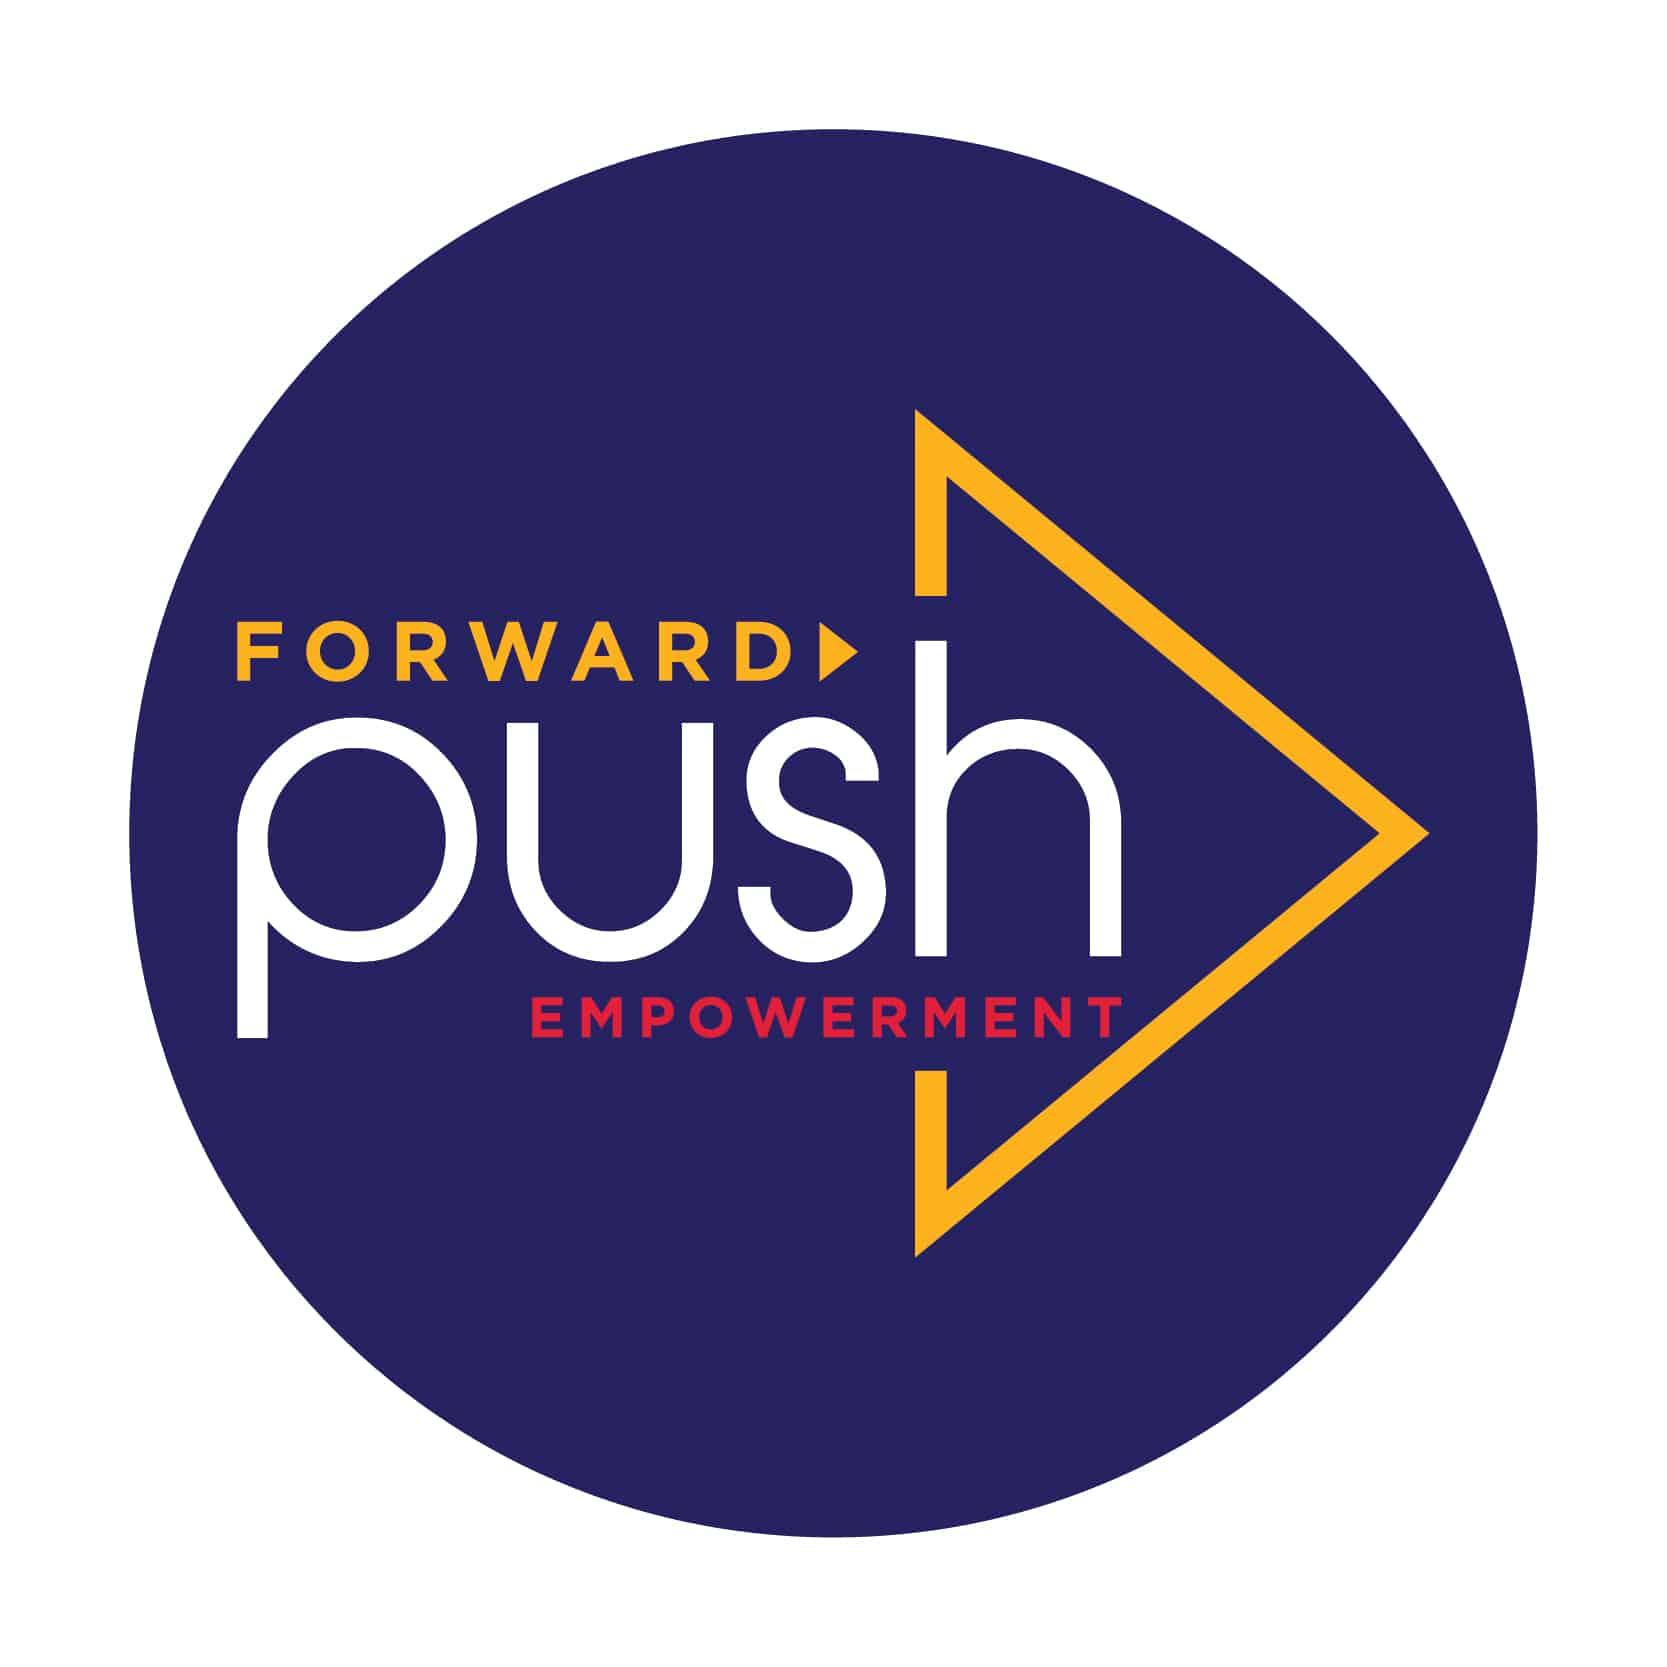 Forward Push Empowerment LLC